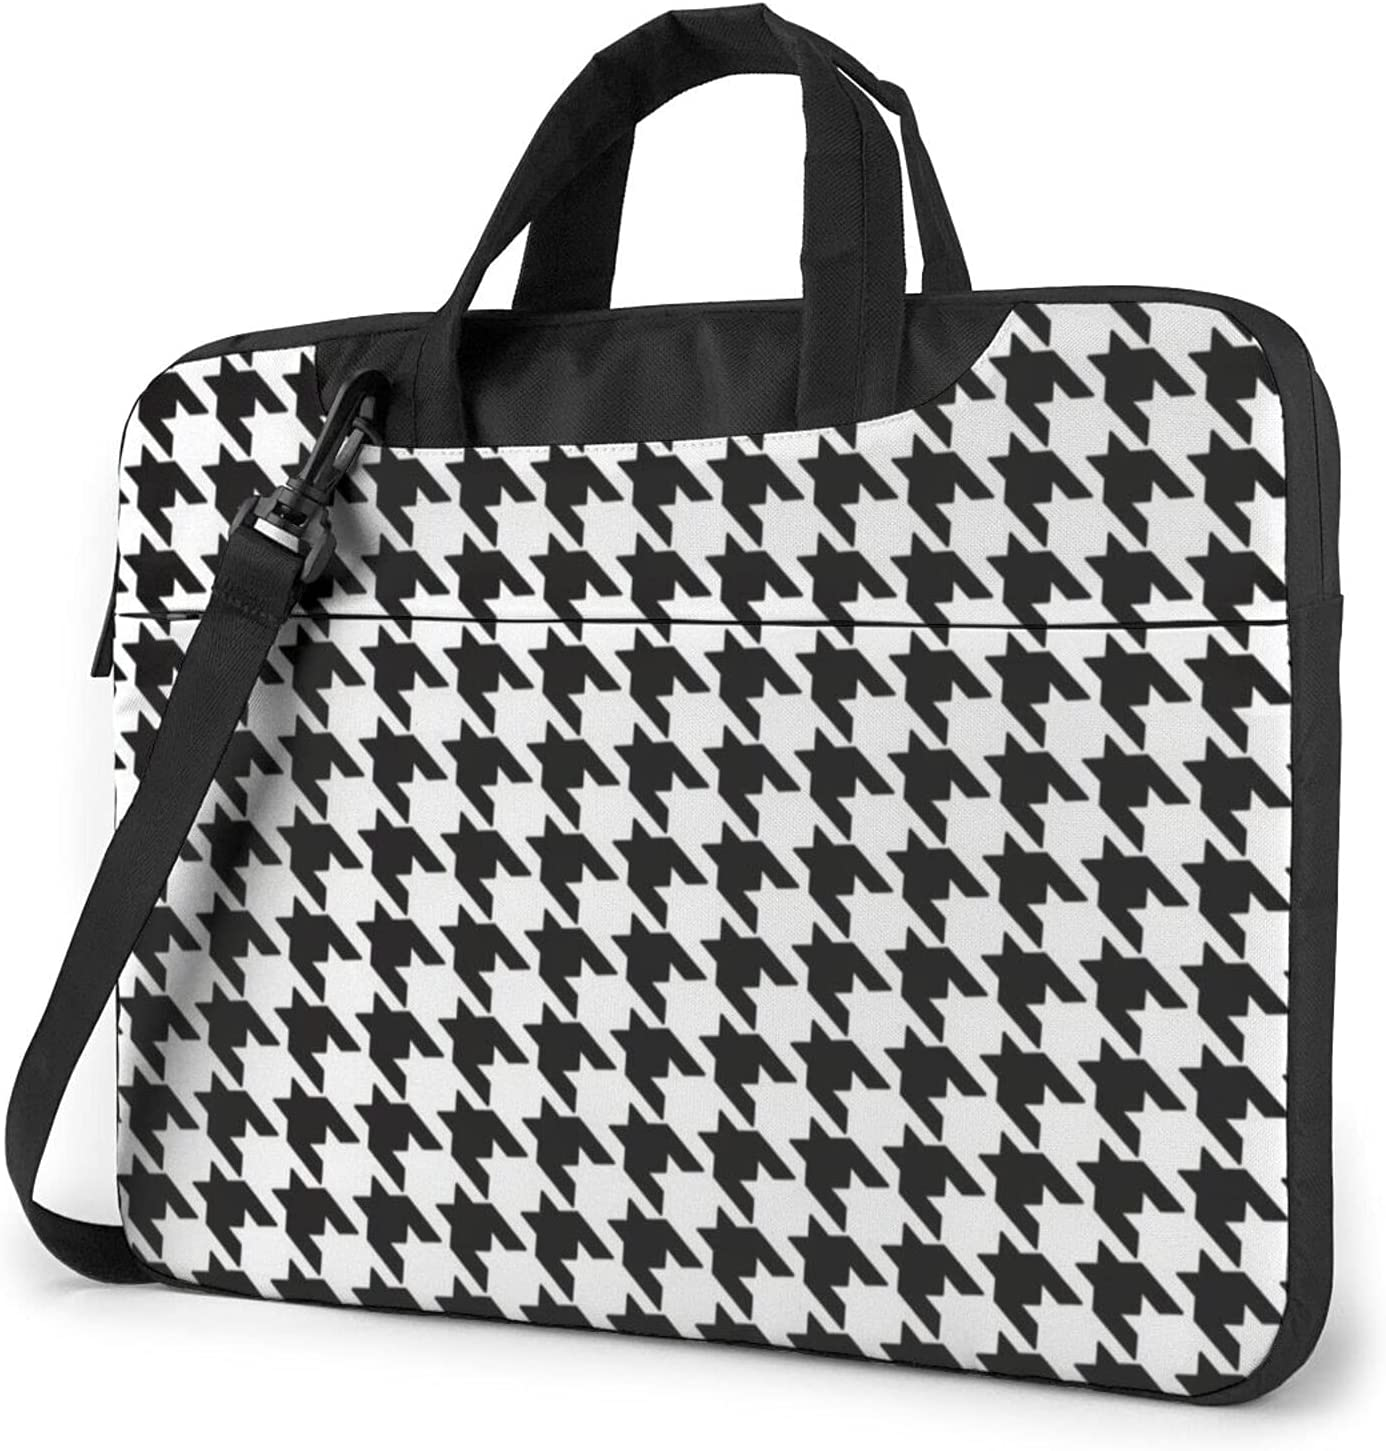 Black White Classic Slim Briefcase Shoulder Crossbody Max 41% OFF Las Vegas Mall Bag Desig